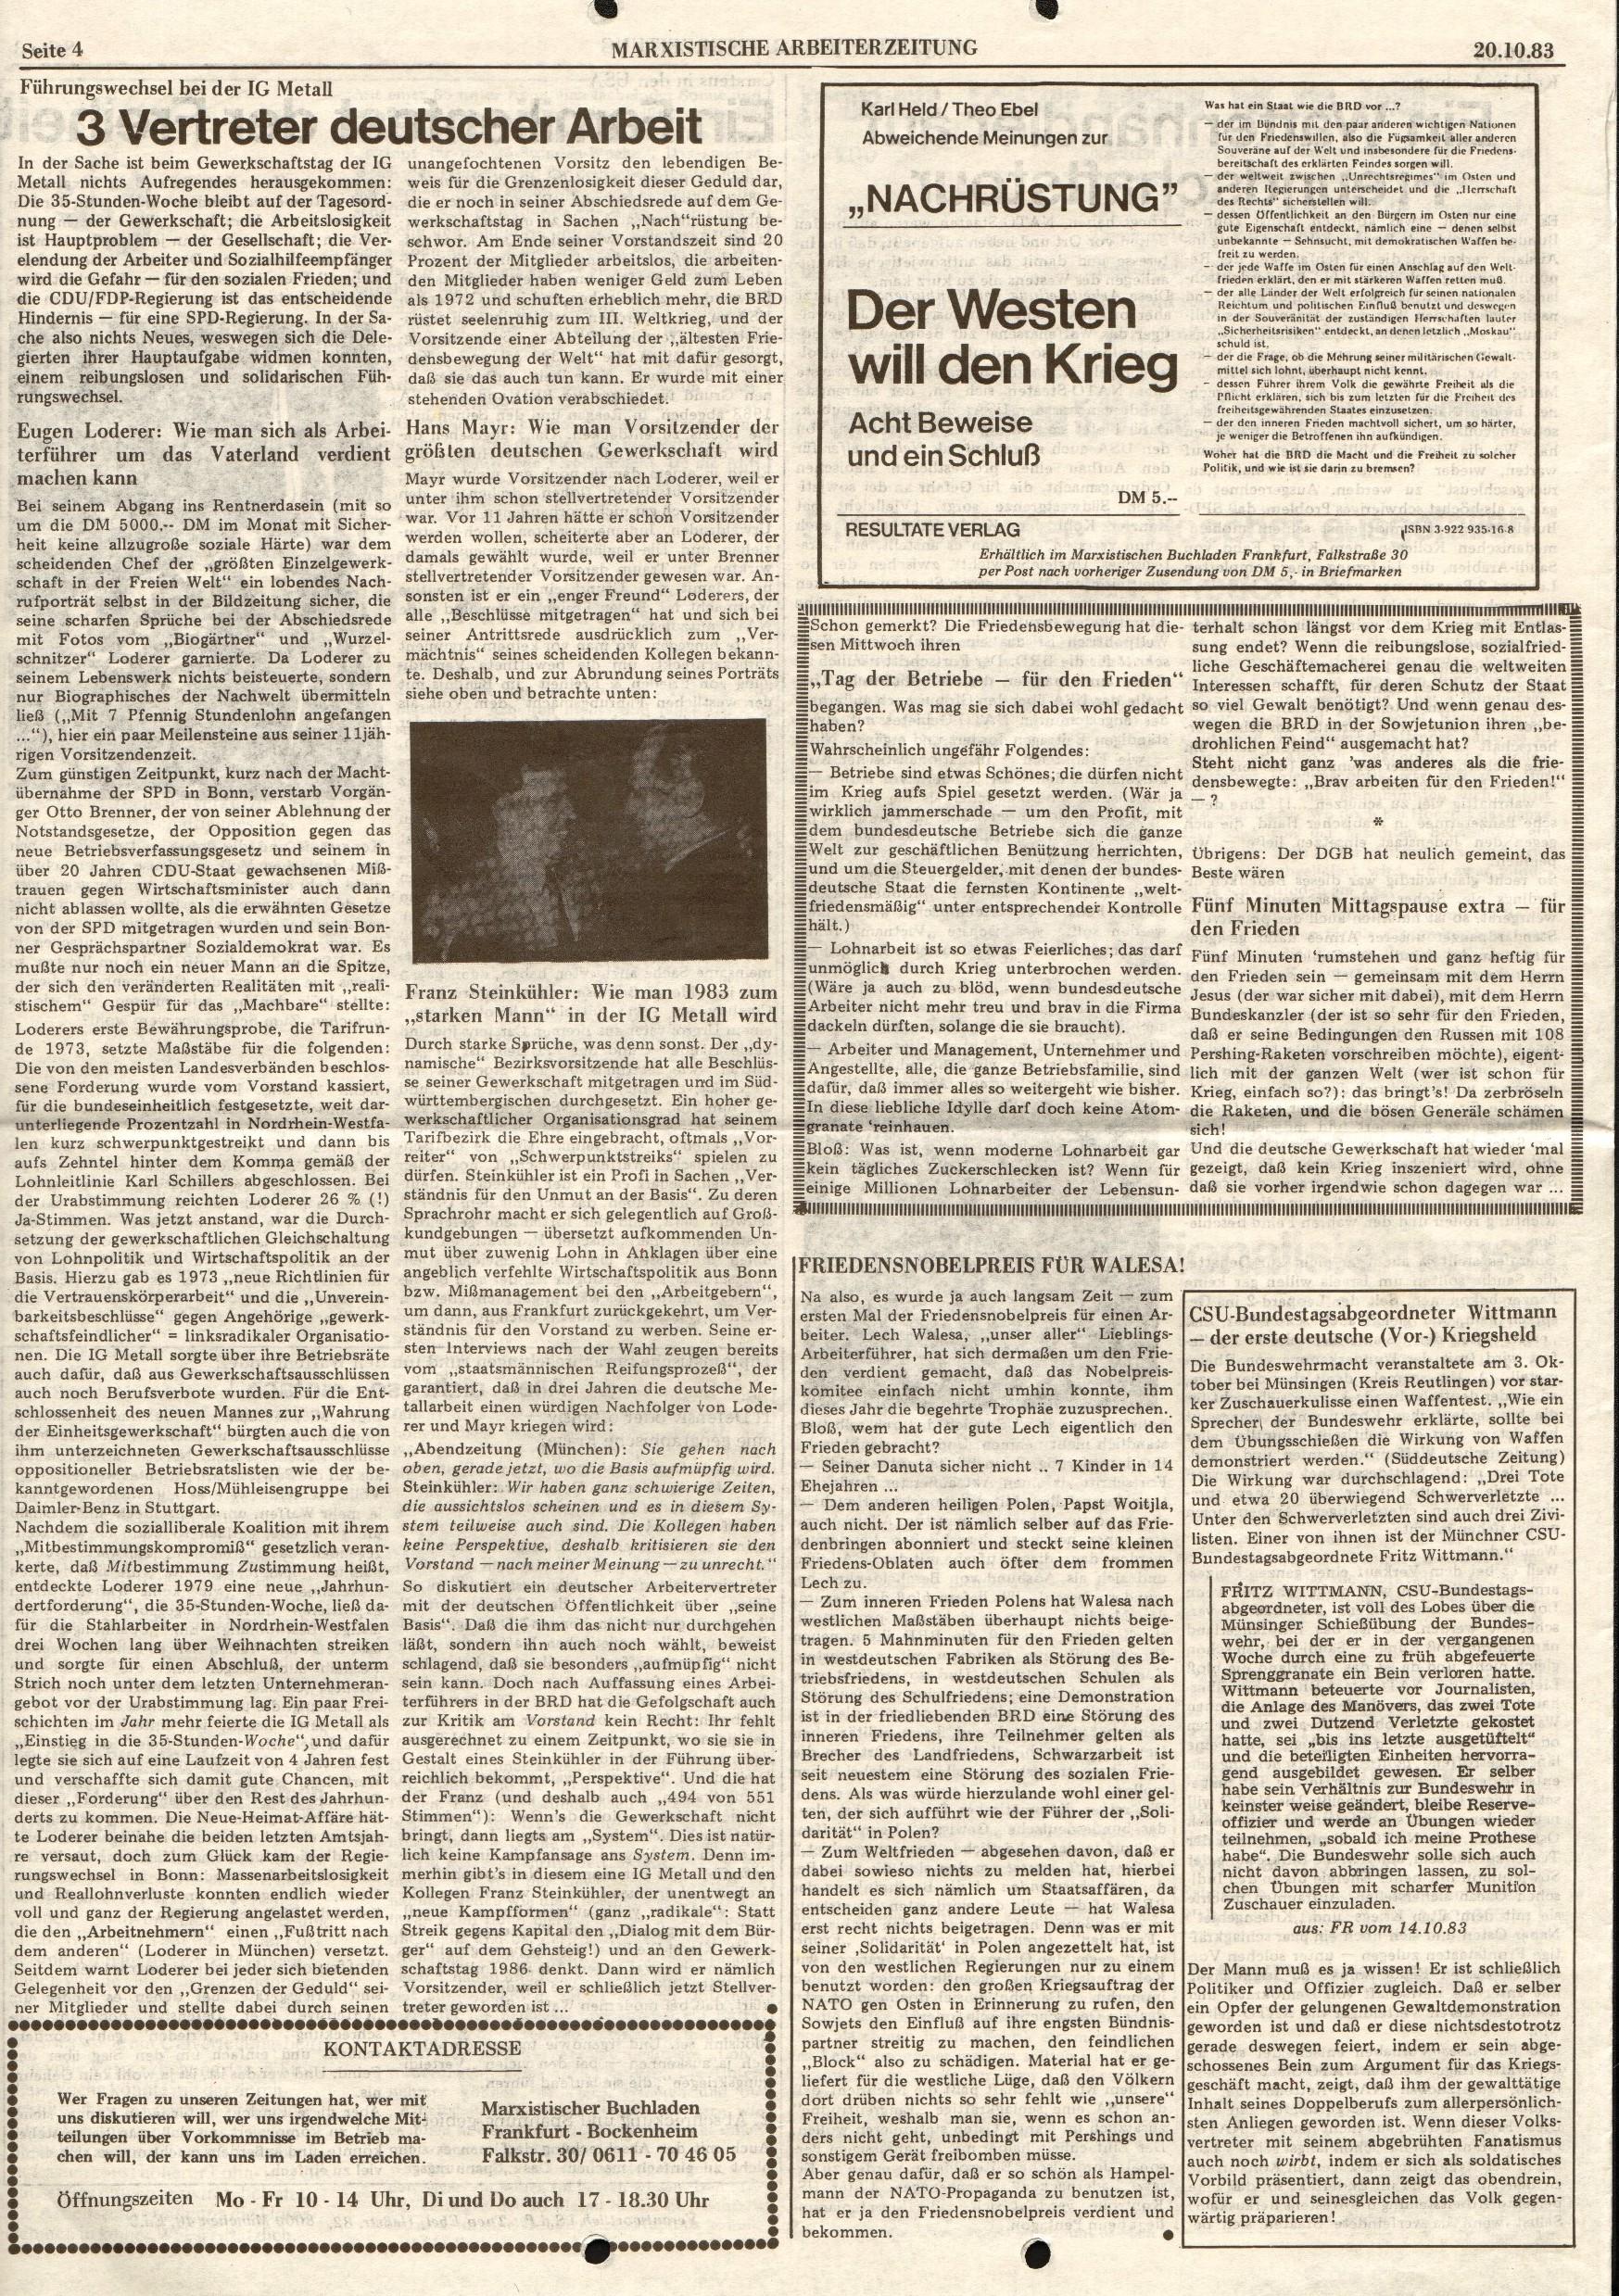 Frankfurt_CPK_Hoechst_MAZ196